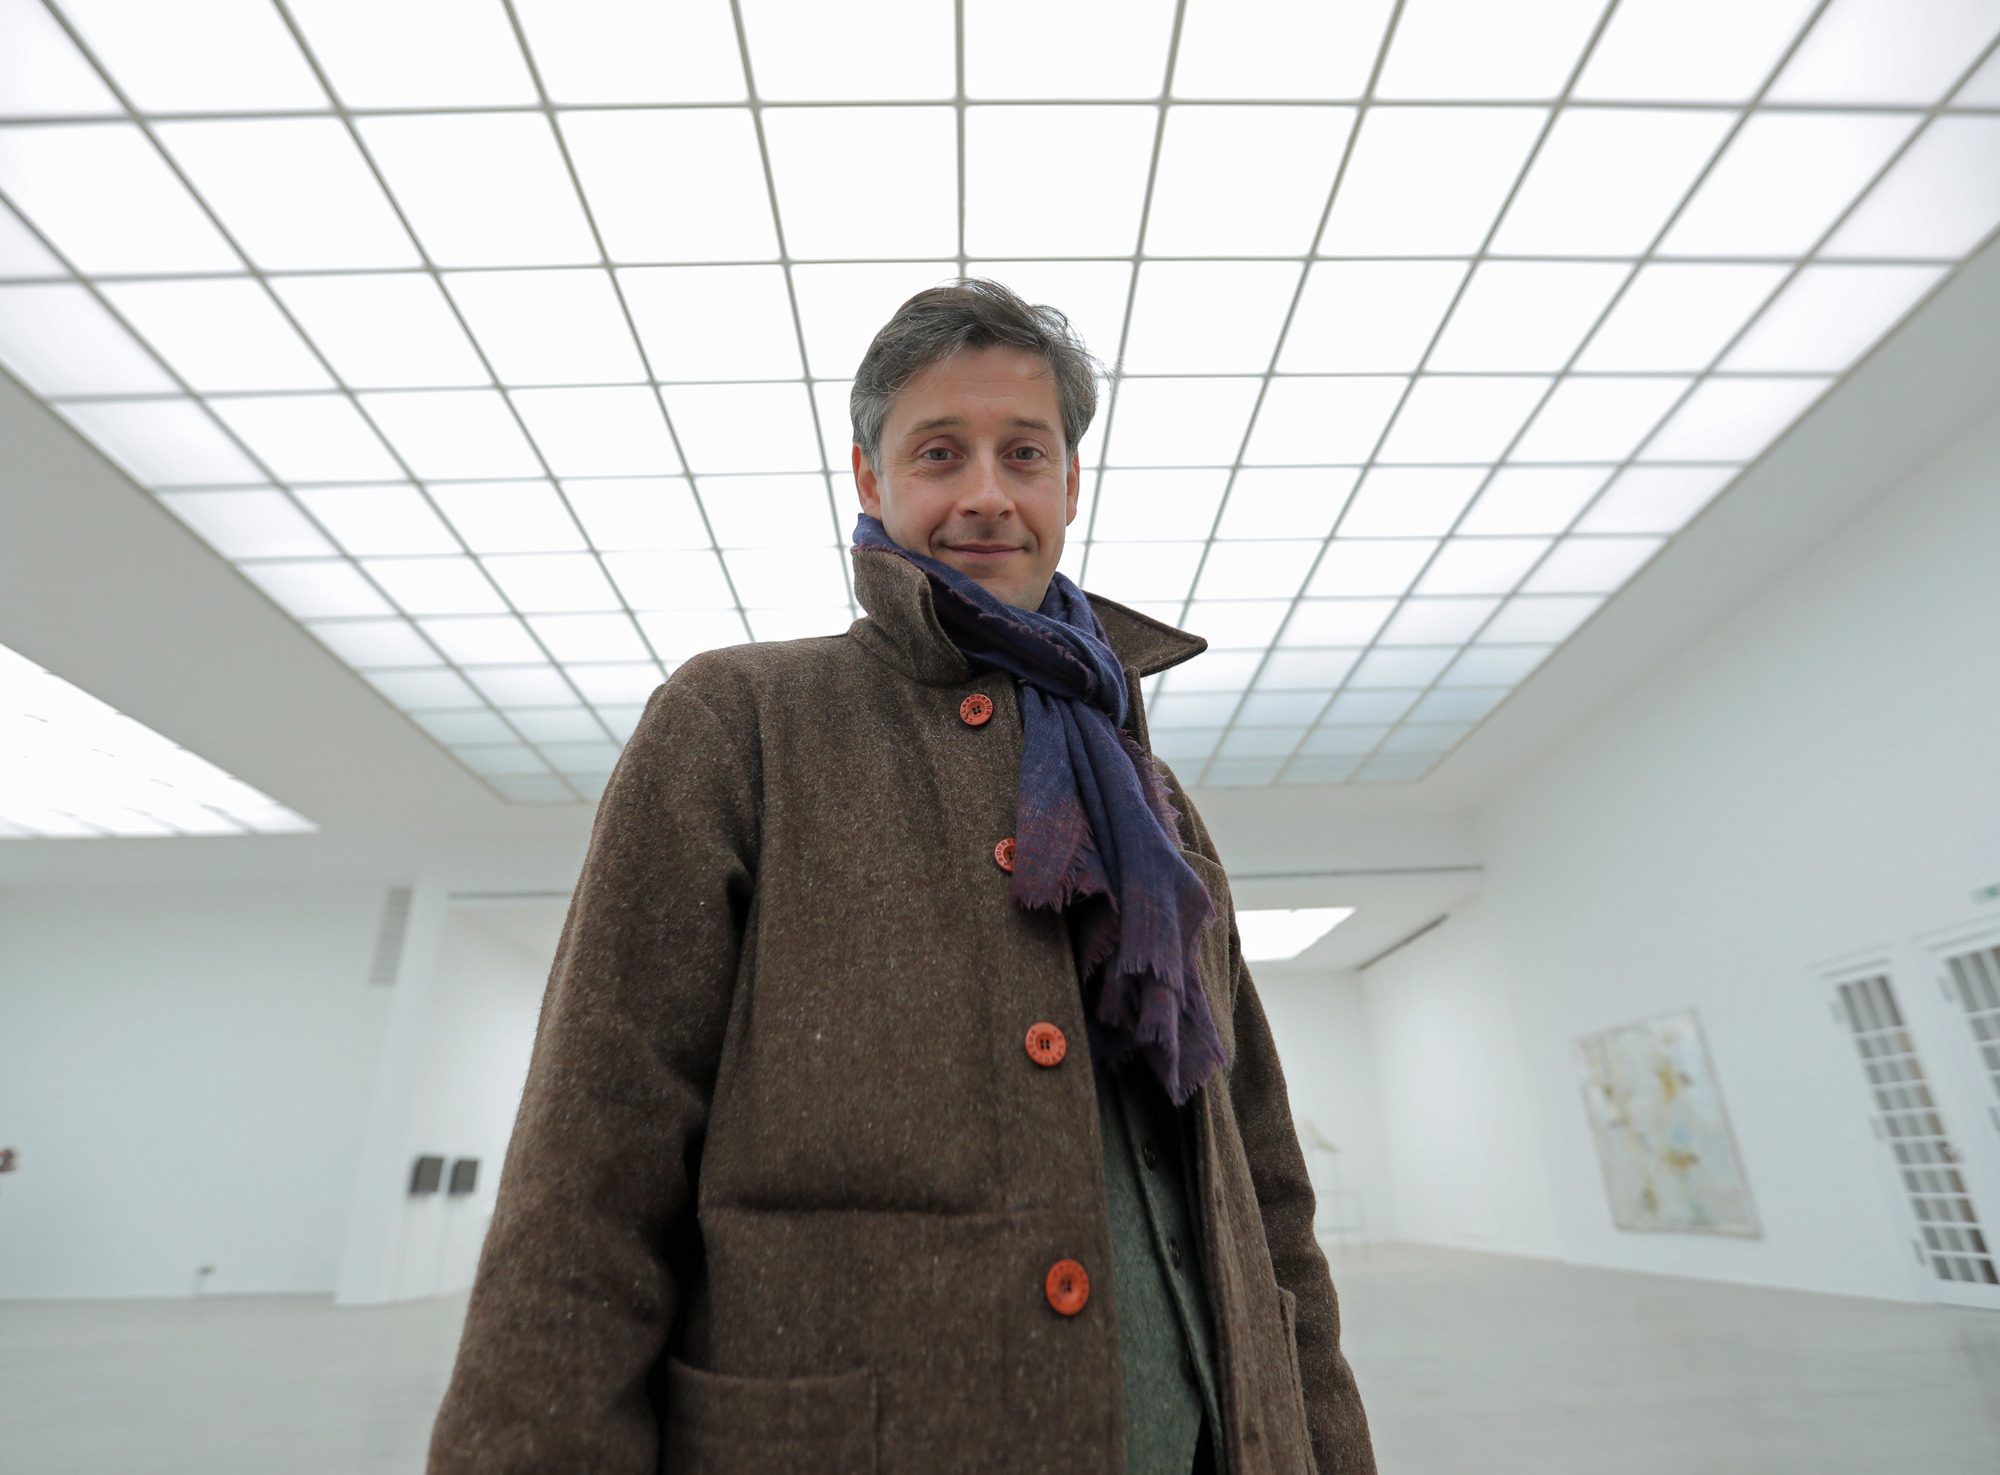 Lachlan Goudie celebrates the work of Charles Rennie Mackintosh in Mackintosh Glasgows Neglected Genius.